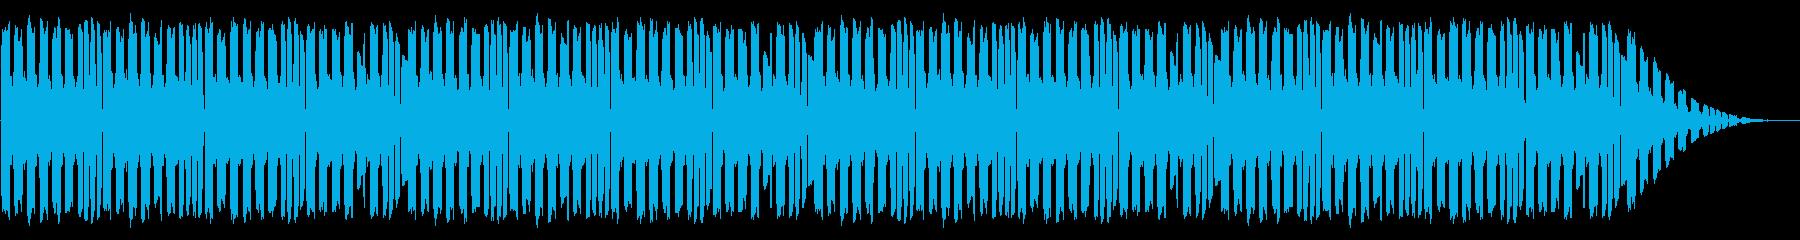 NES RPG B08-1(フィールド2の再生済みの波形